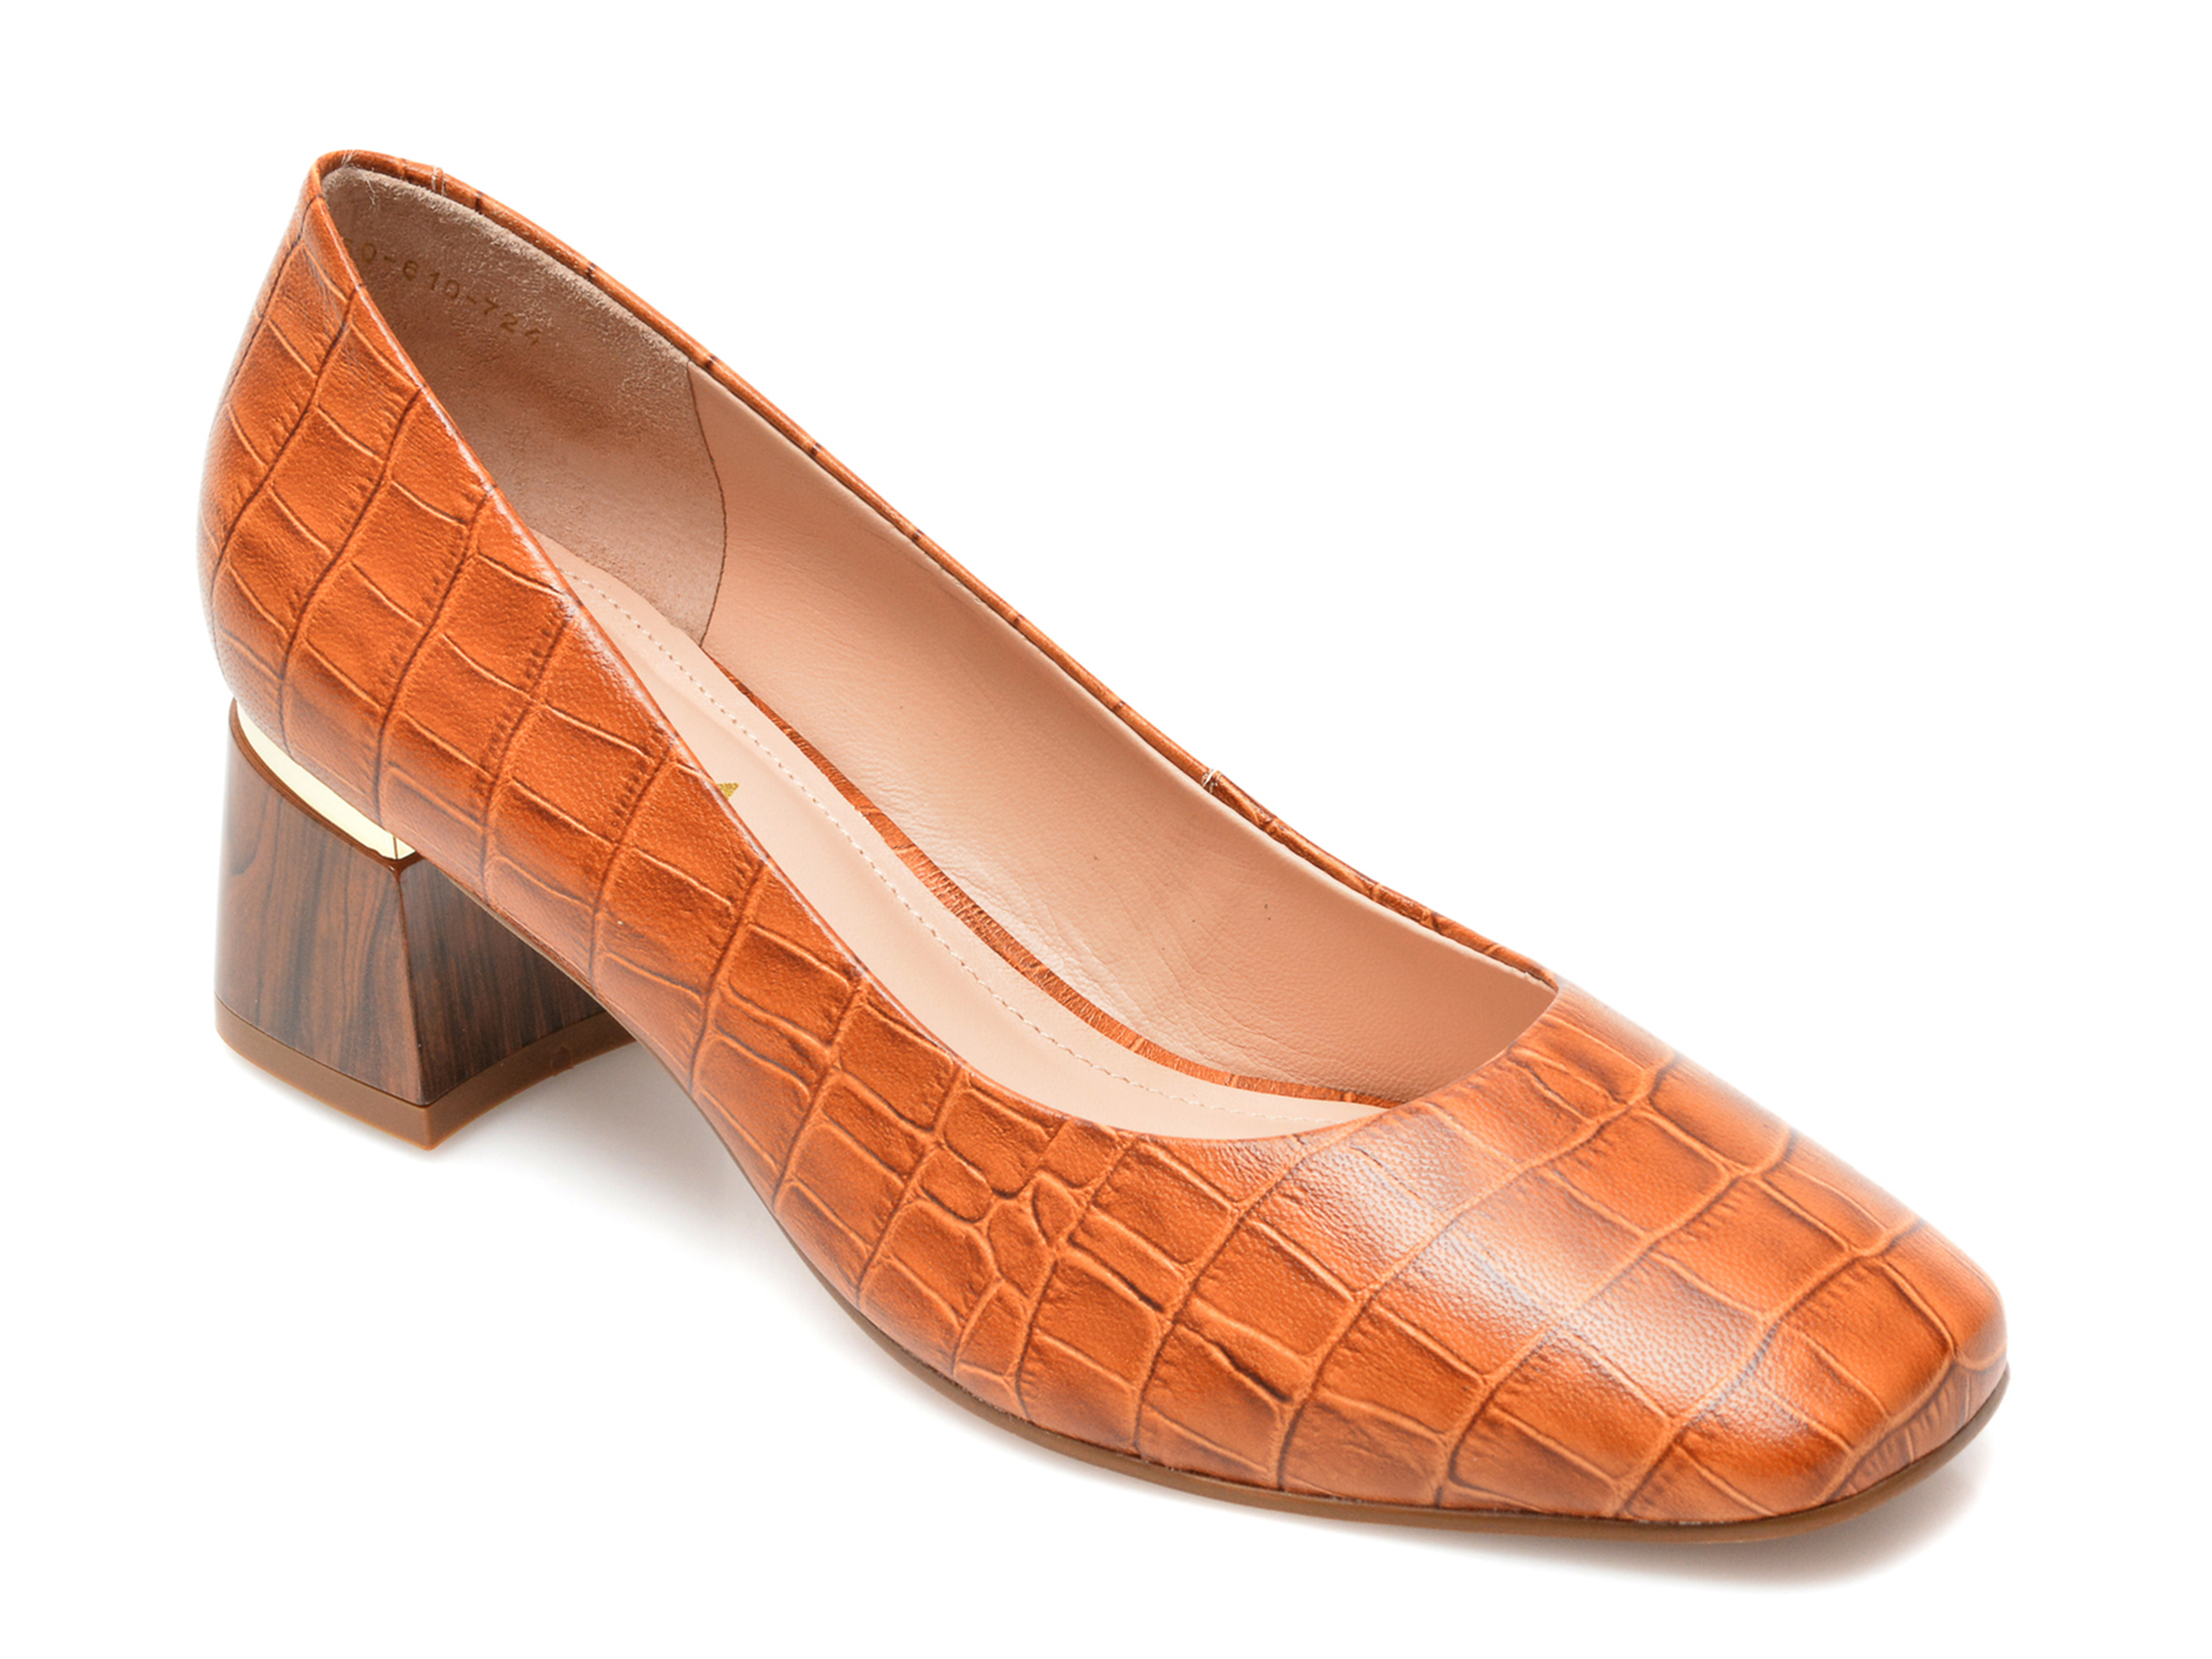 Pantofi EPICA maro, 2060724, din piele naturala imagine otter.ro